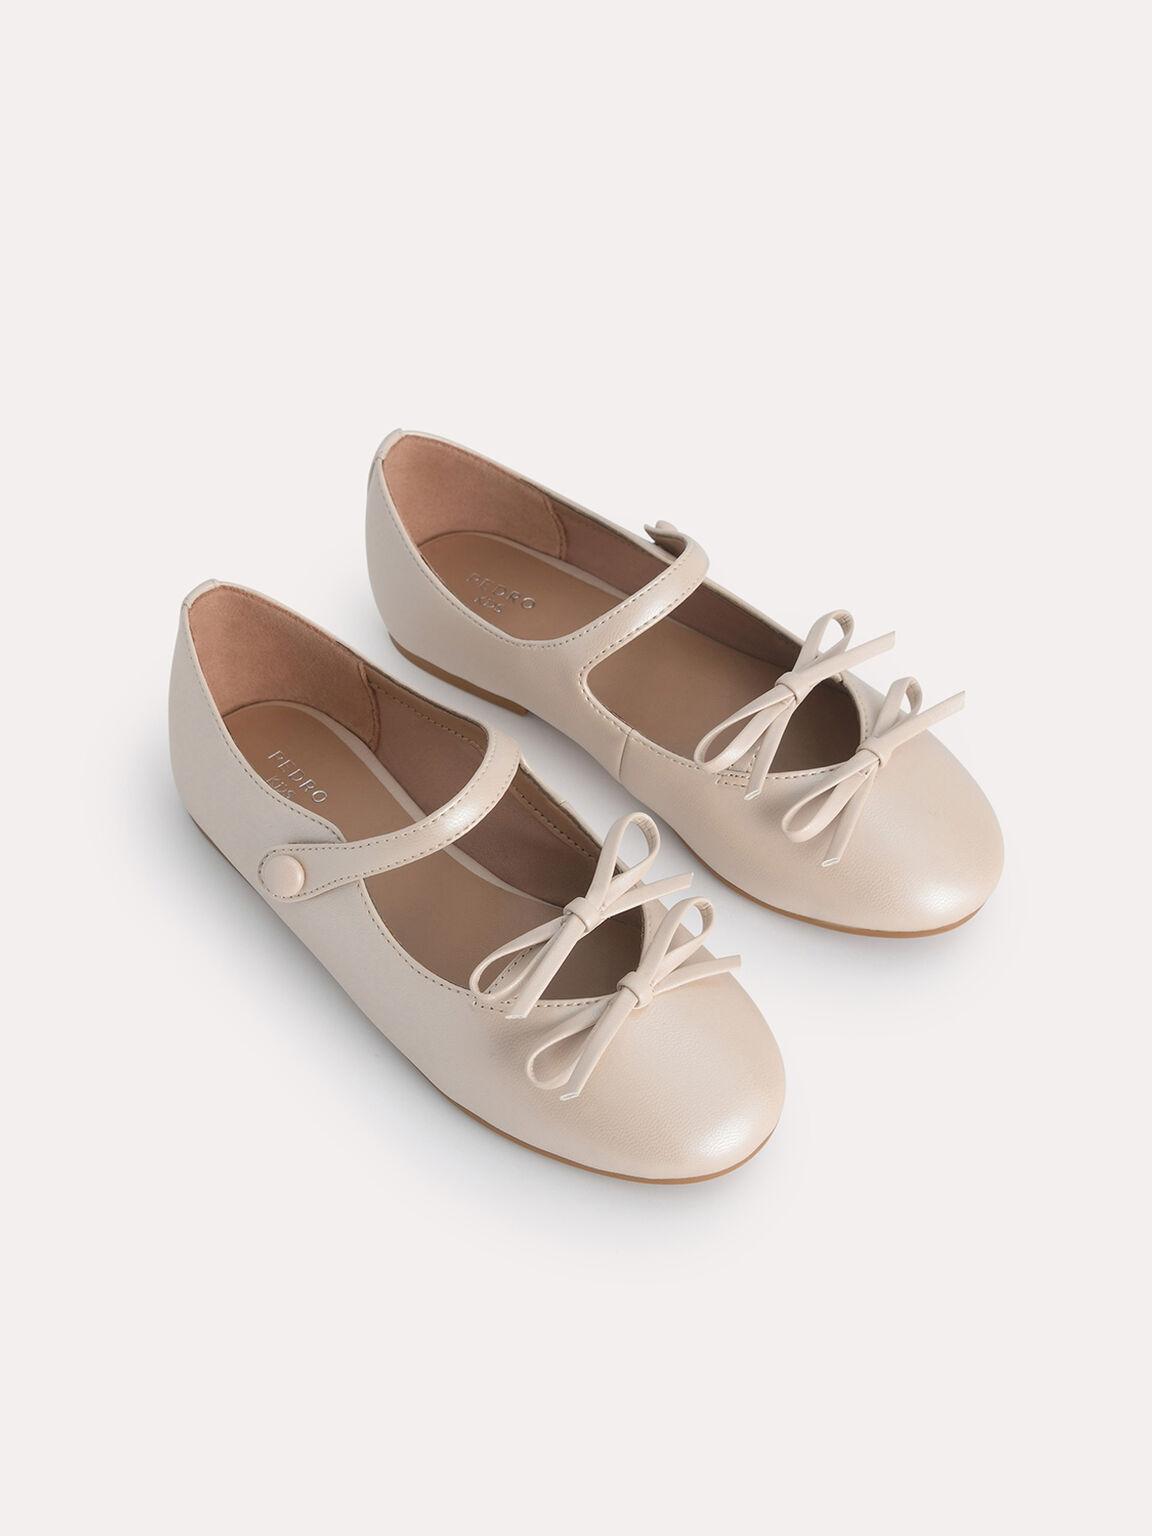 Double Bow Ballerina Flats, Nude, hi-res